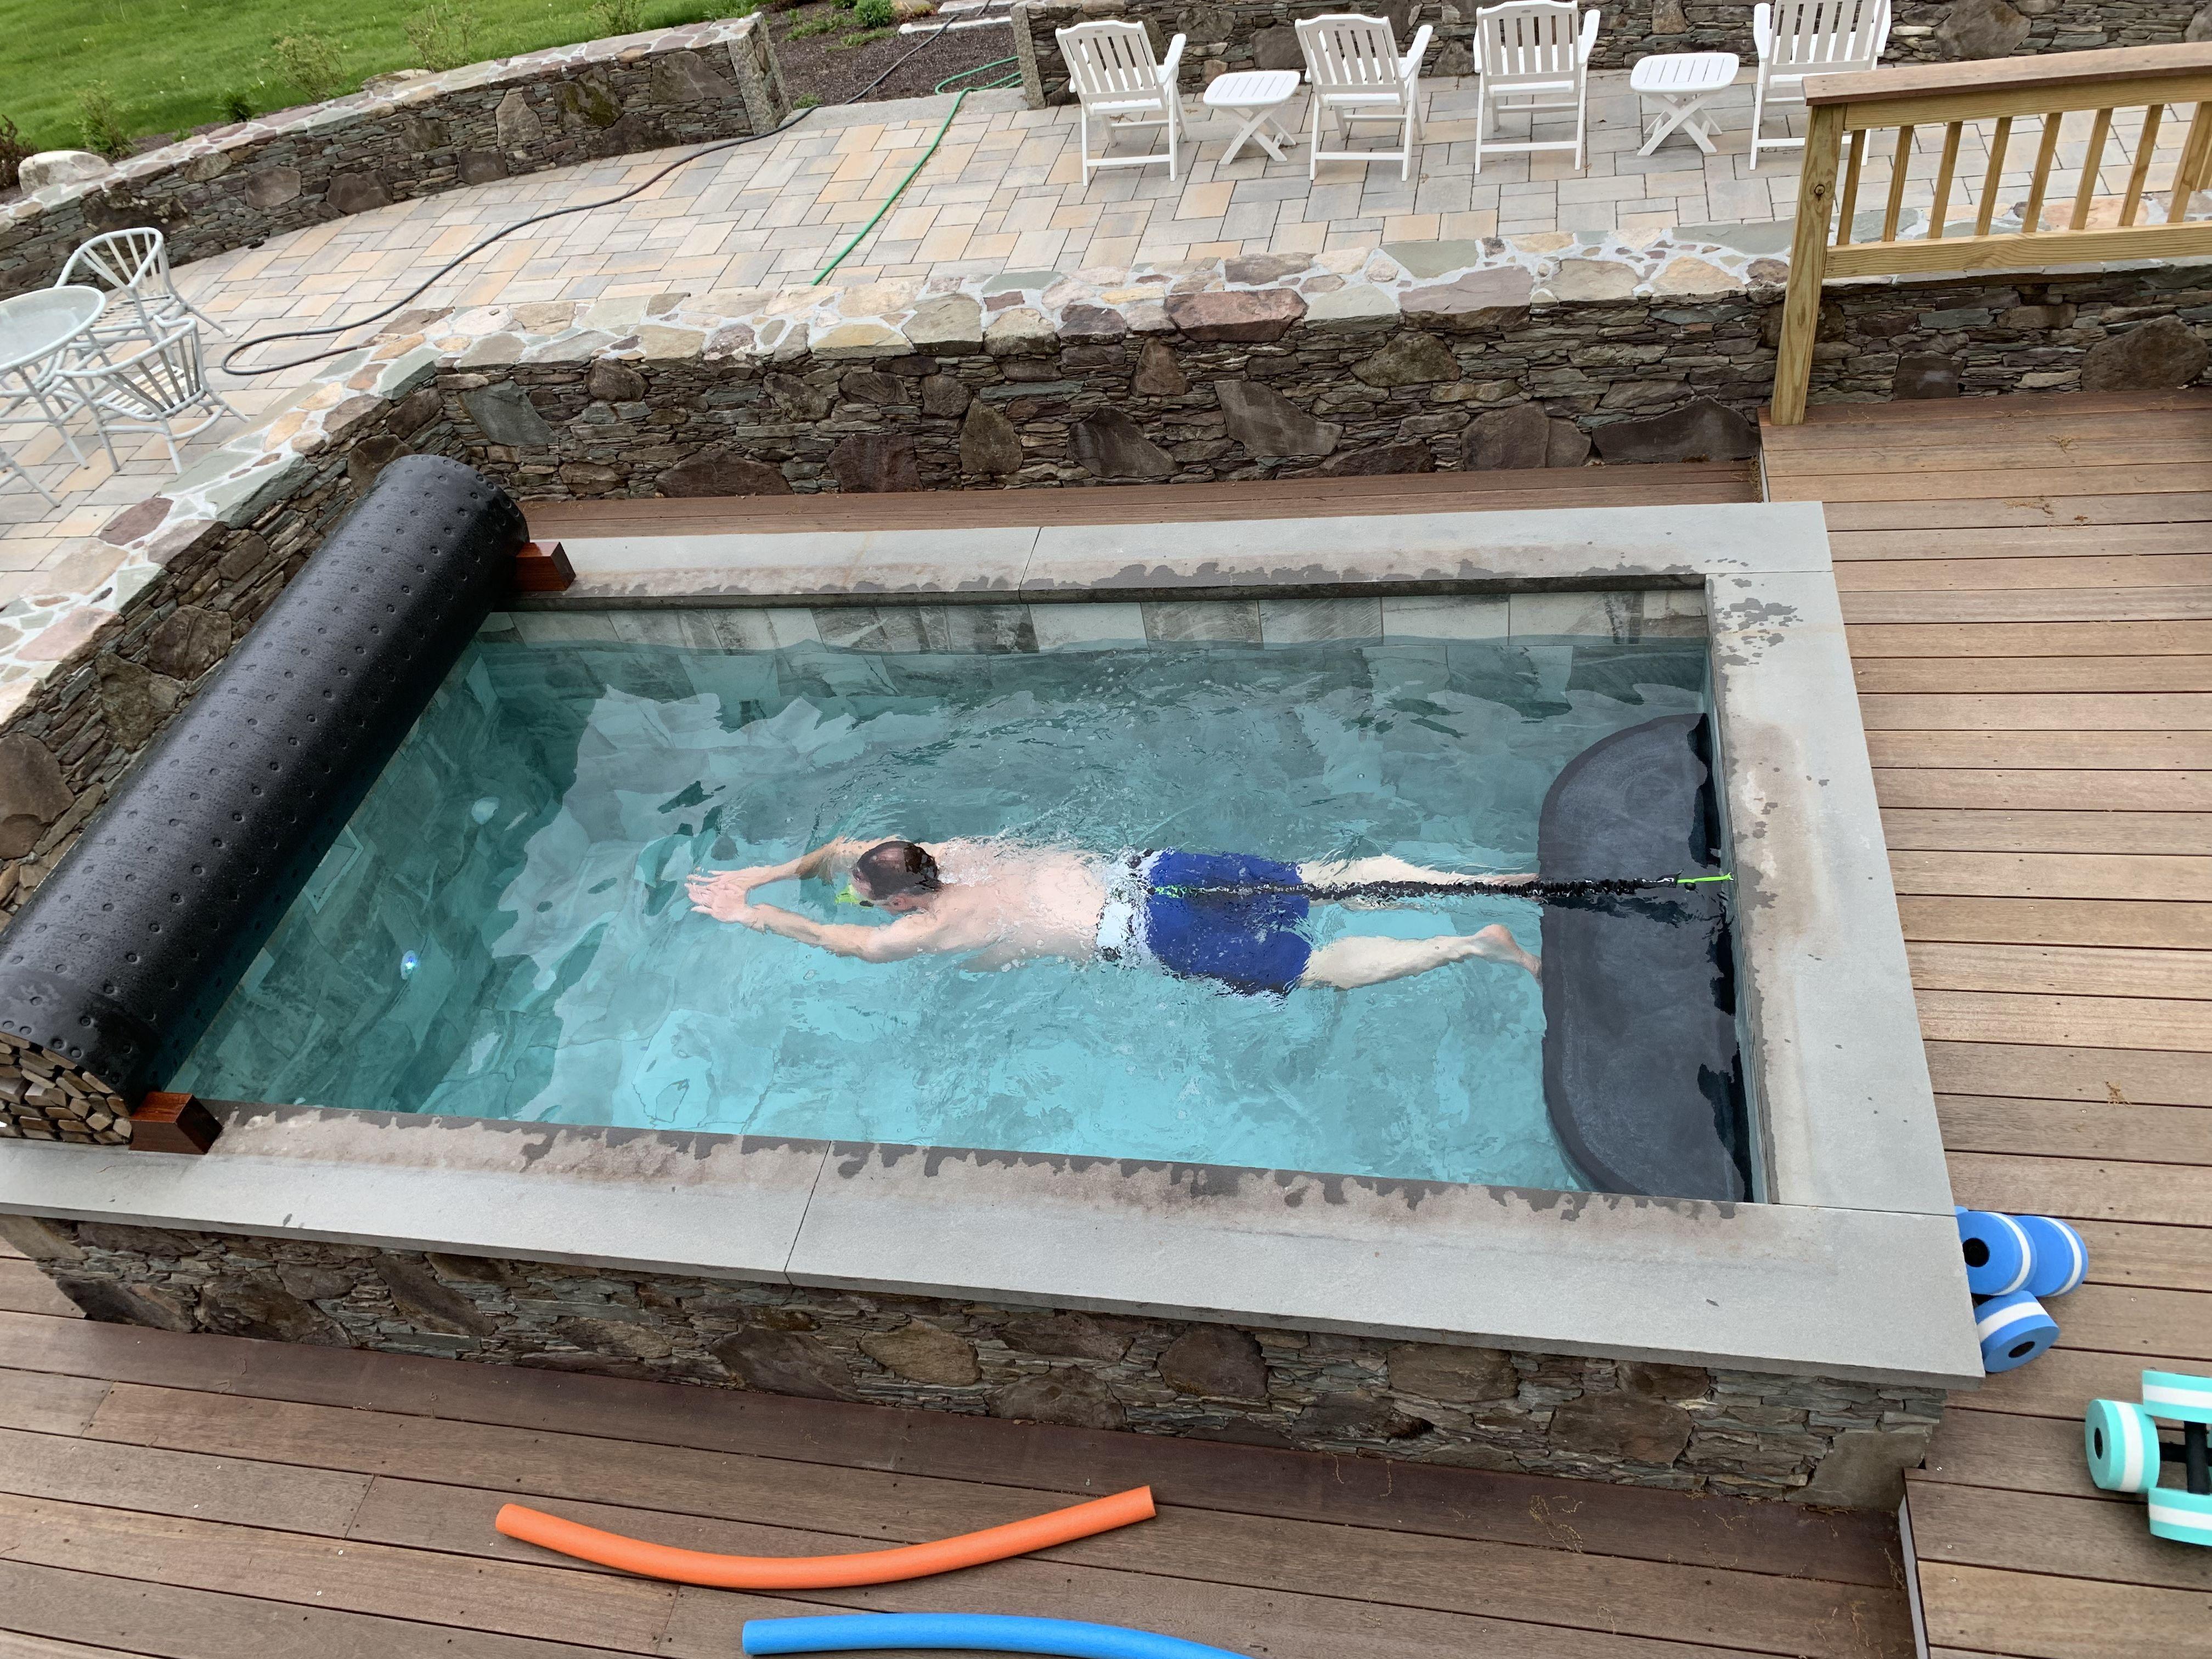 Static Swim In A Soake Pool Diy Swimming Pool Small Pools Small Backyard Pools